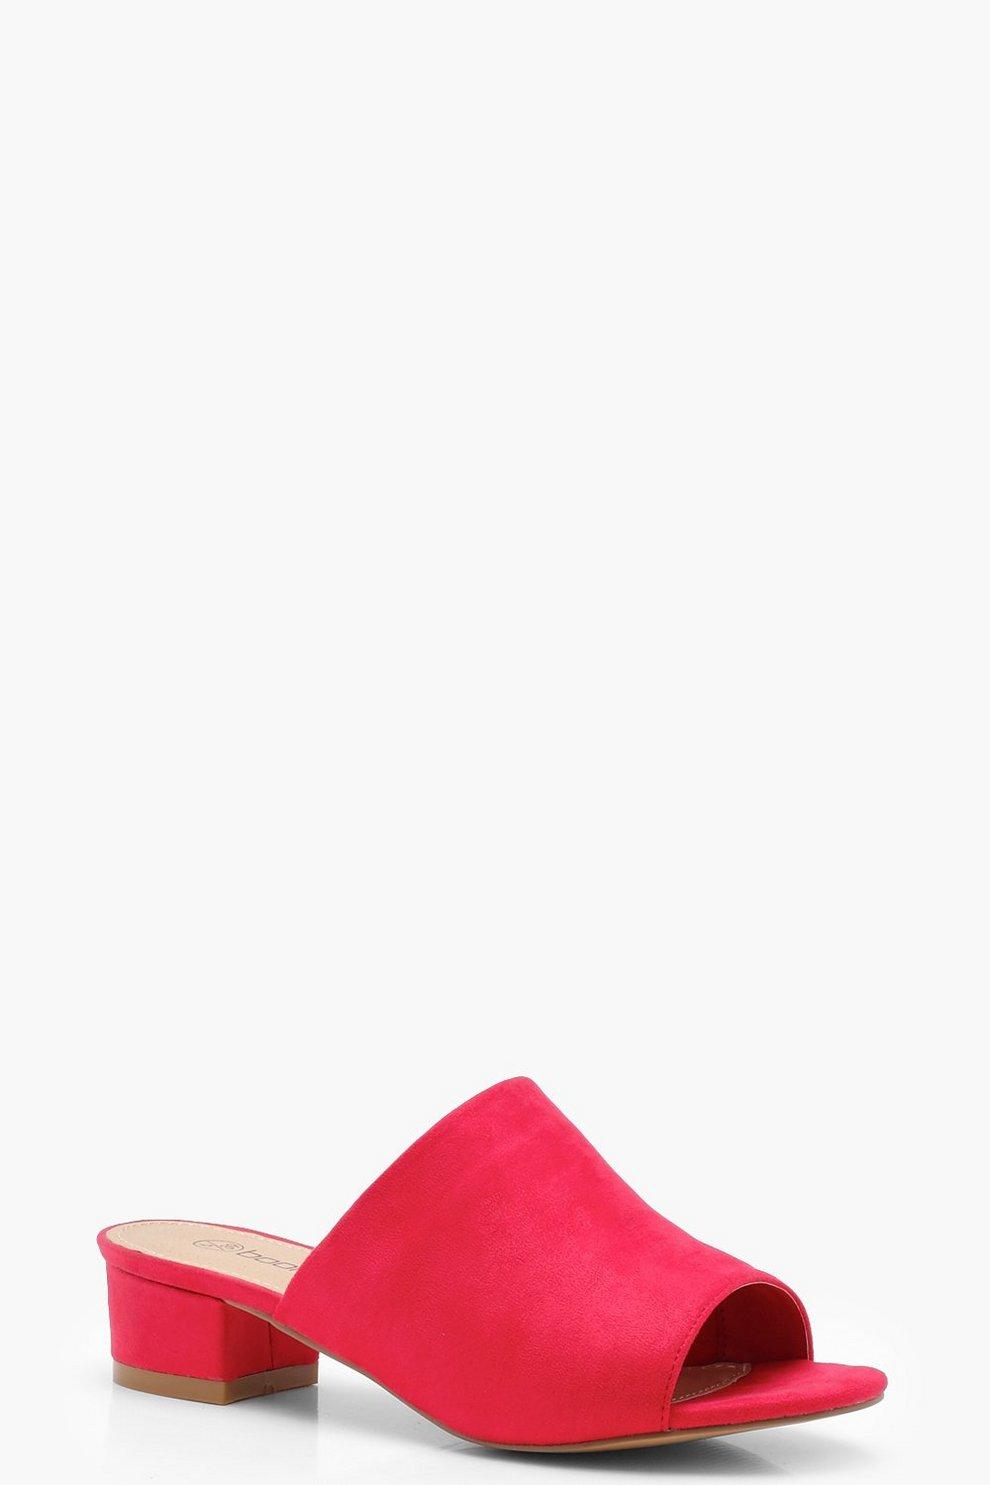 Sandalias planas con la punta abierta anchas de Poppy planas S6pOecOqo